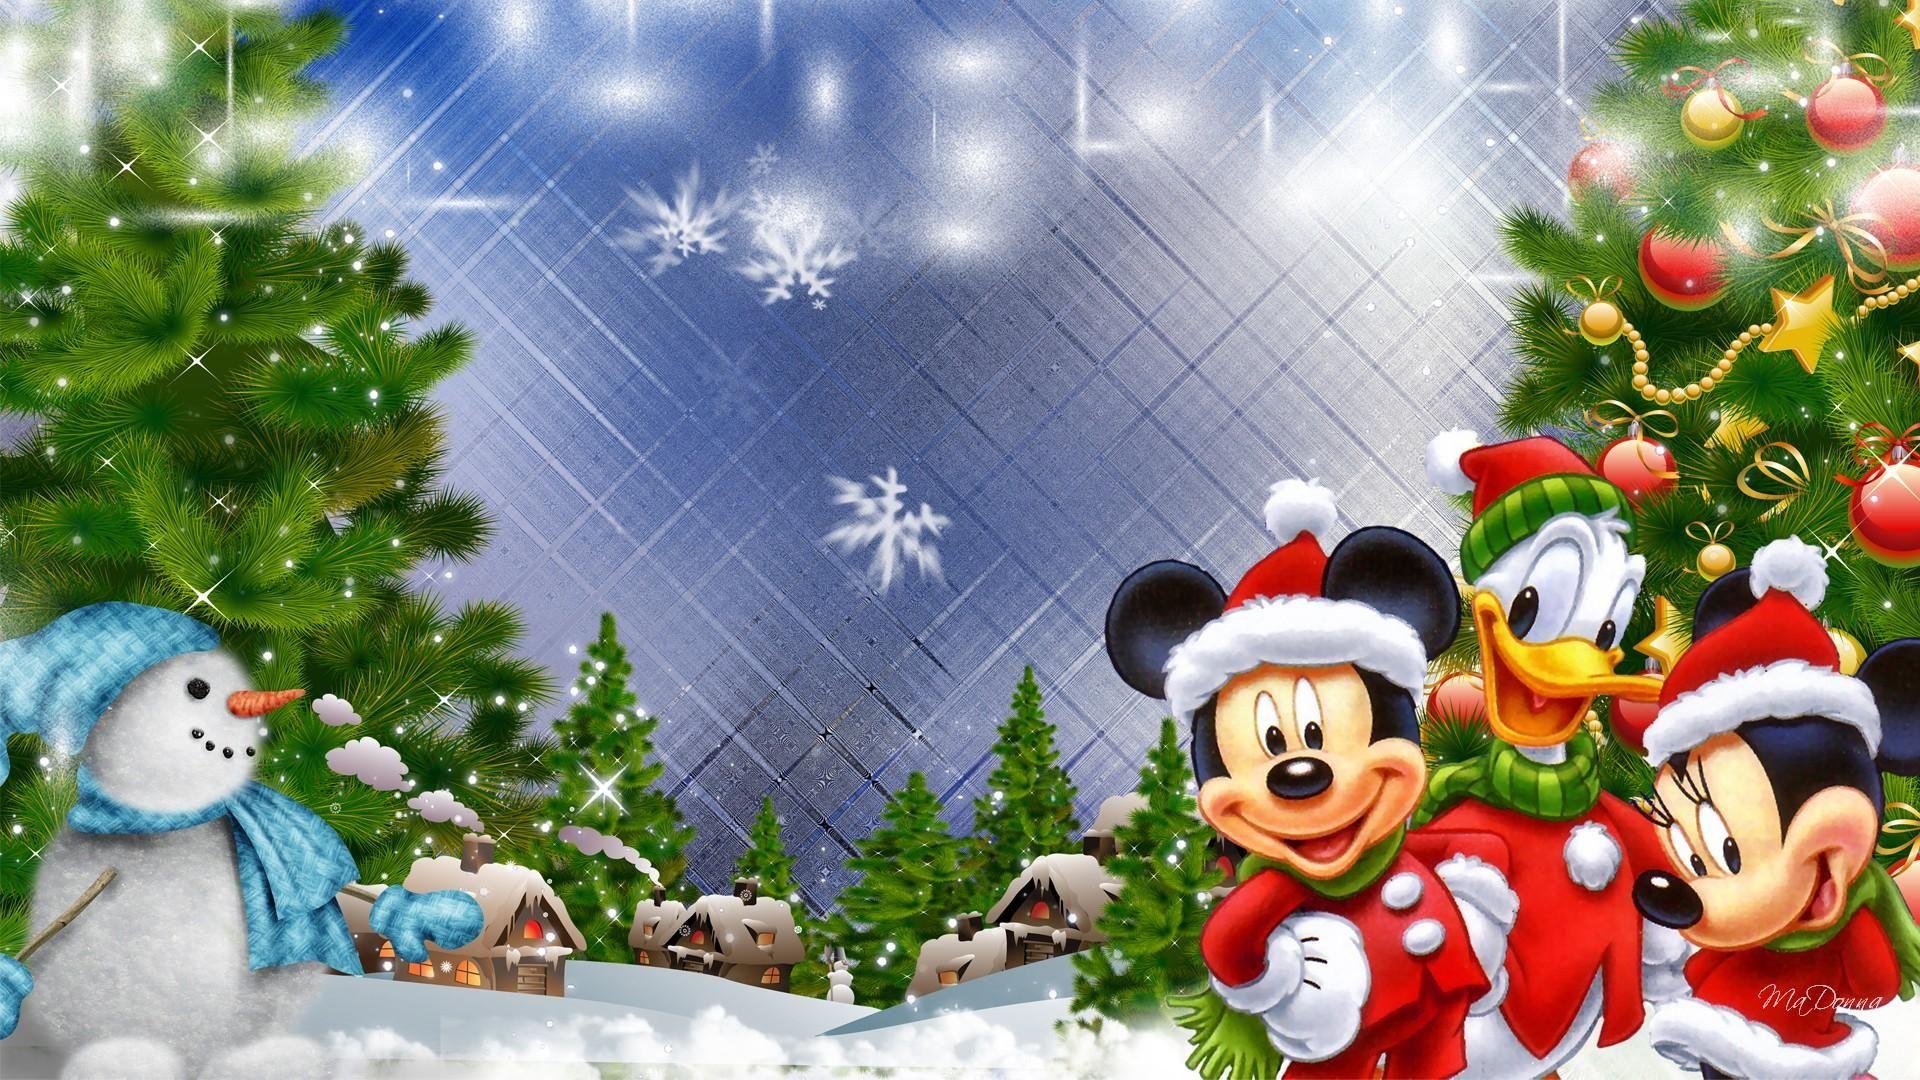 Fantastic Wallpaper Christmas Mickey Mouse - d165579241e3959699896e35abaaf9ad  Gallery_40774 .jpg